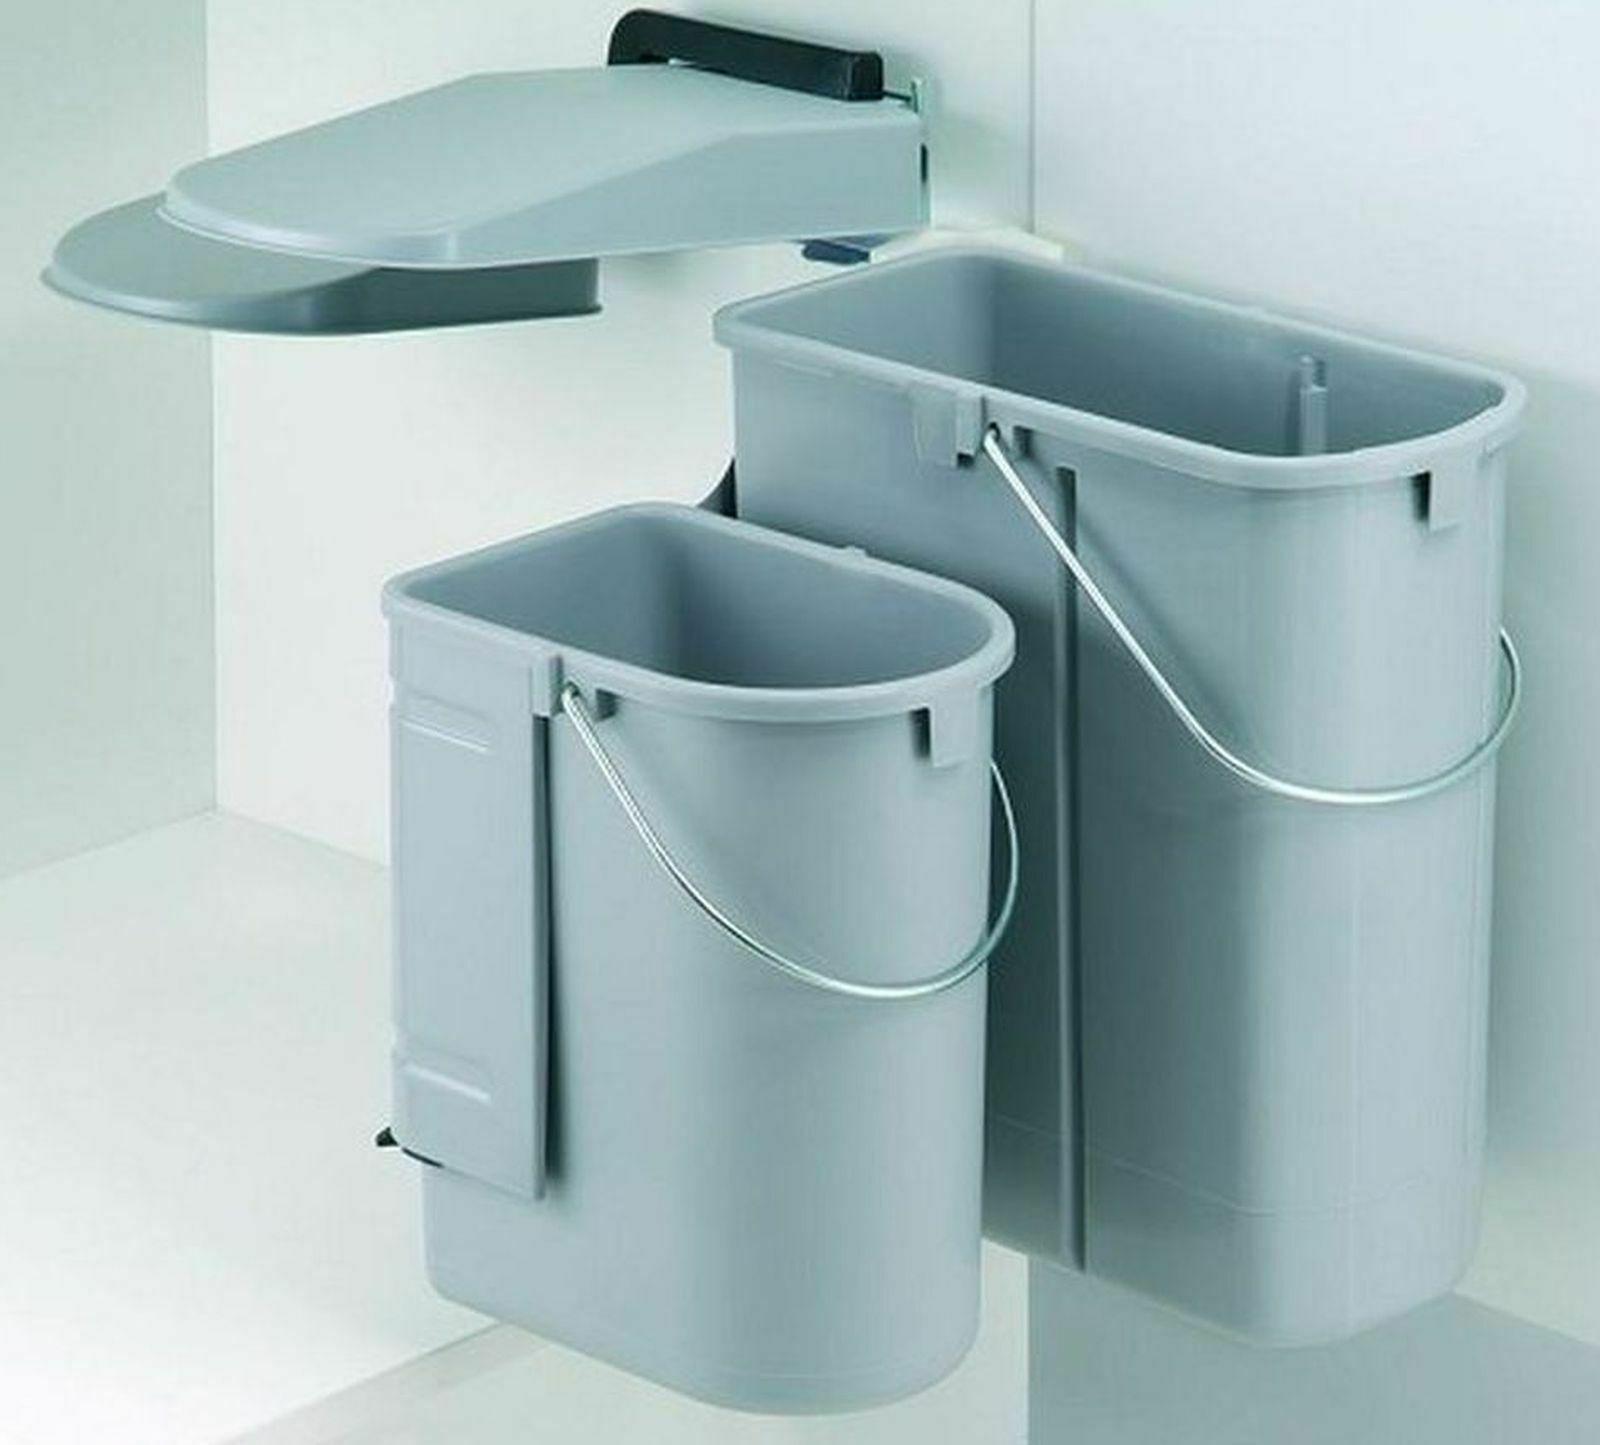 Full Size of 5e2704d6f0142 Müllsystem Küche Wohnzimmer Müllsystem